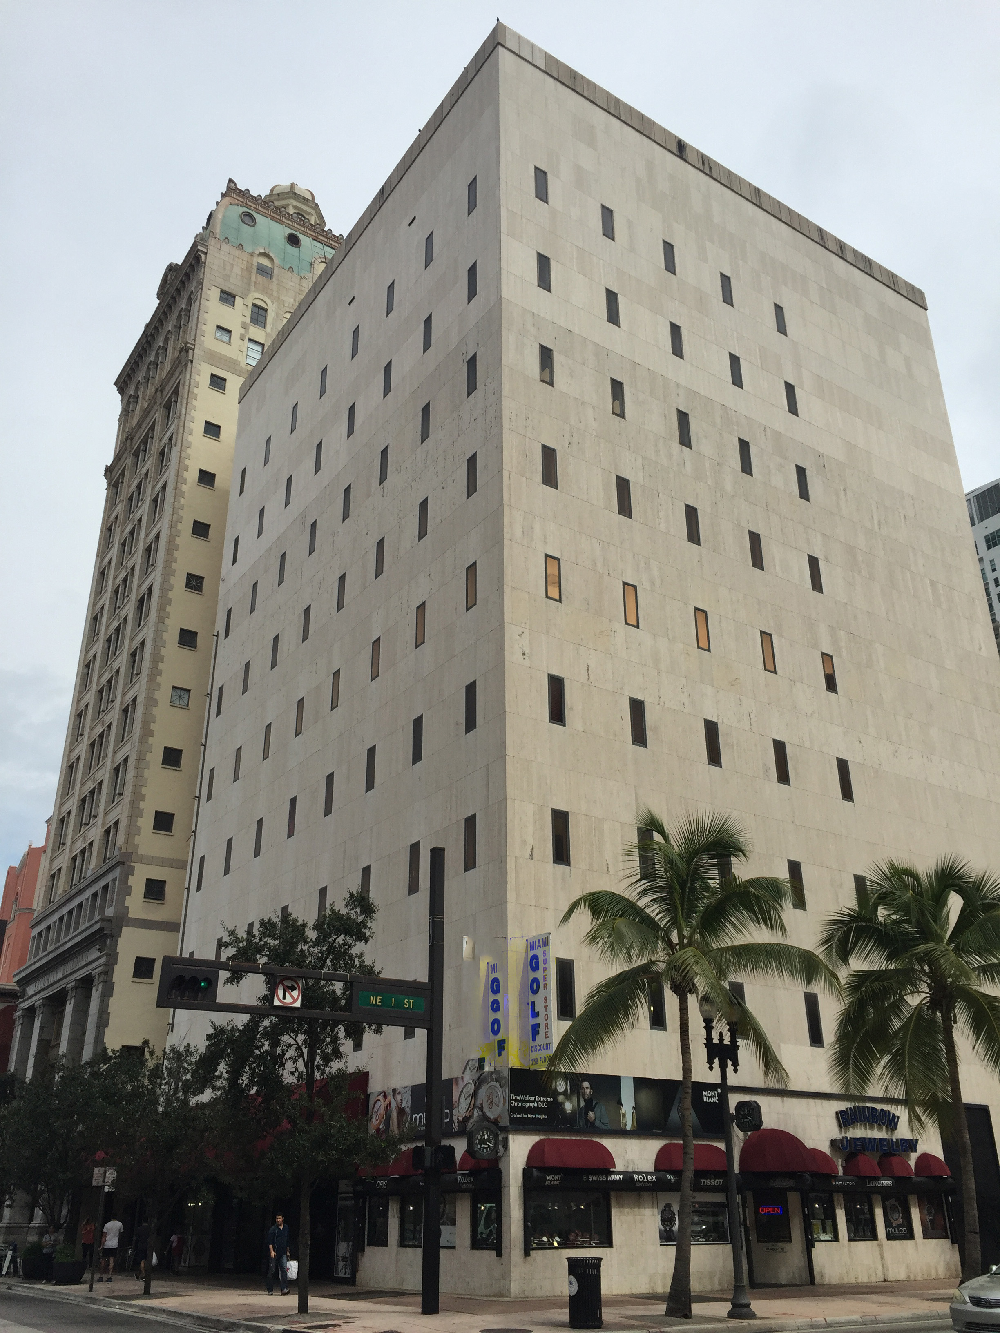 mindwarehouse - 111 NE 1st Street - Miami, FL